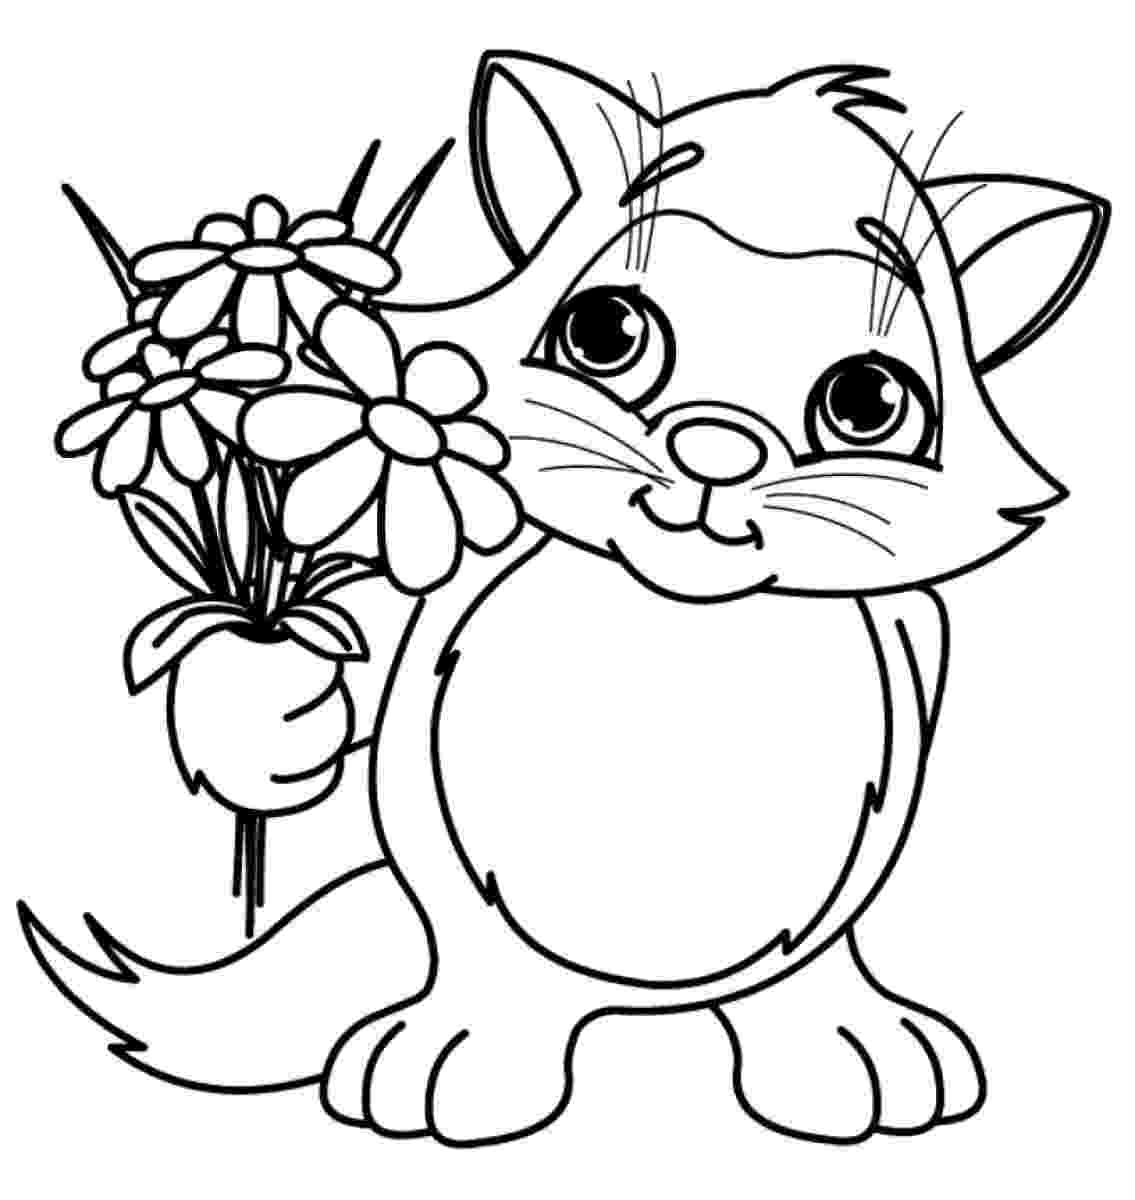 flower coloring books free printable flower coloring pages for kids best books flower coloring